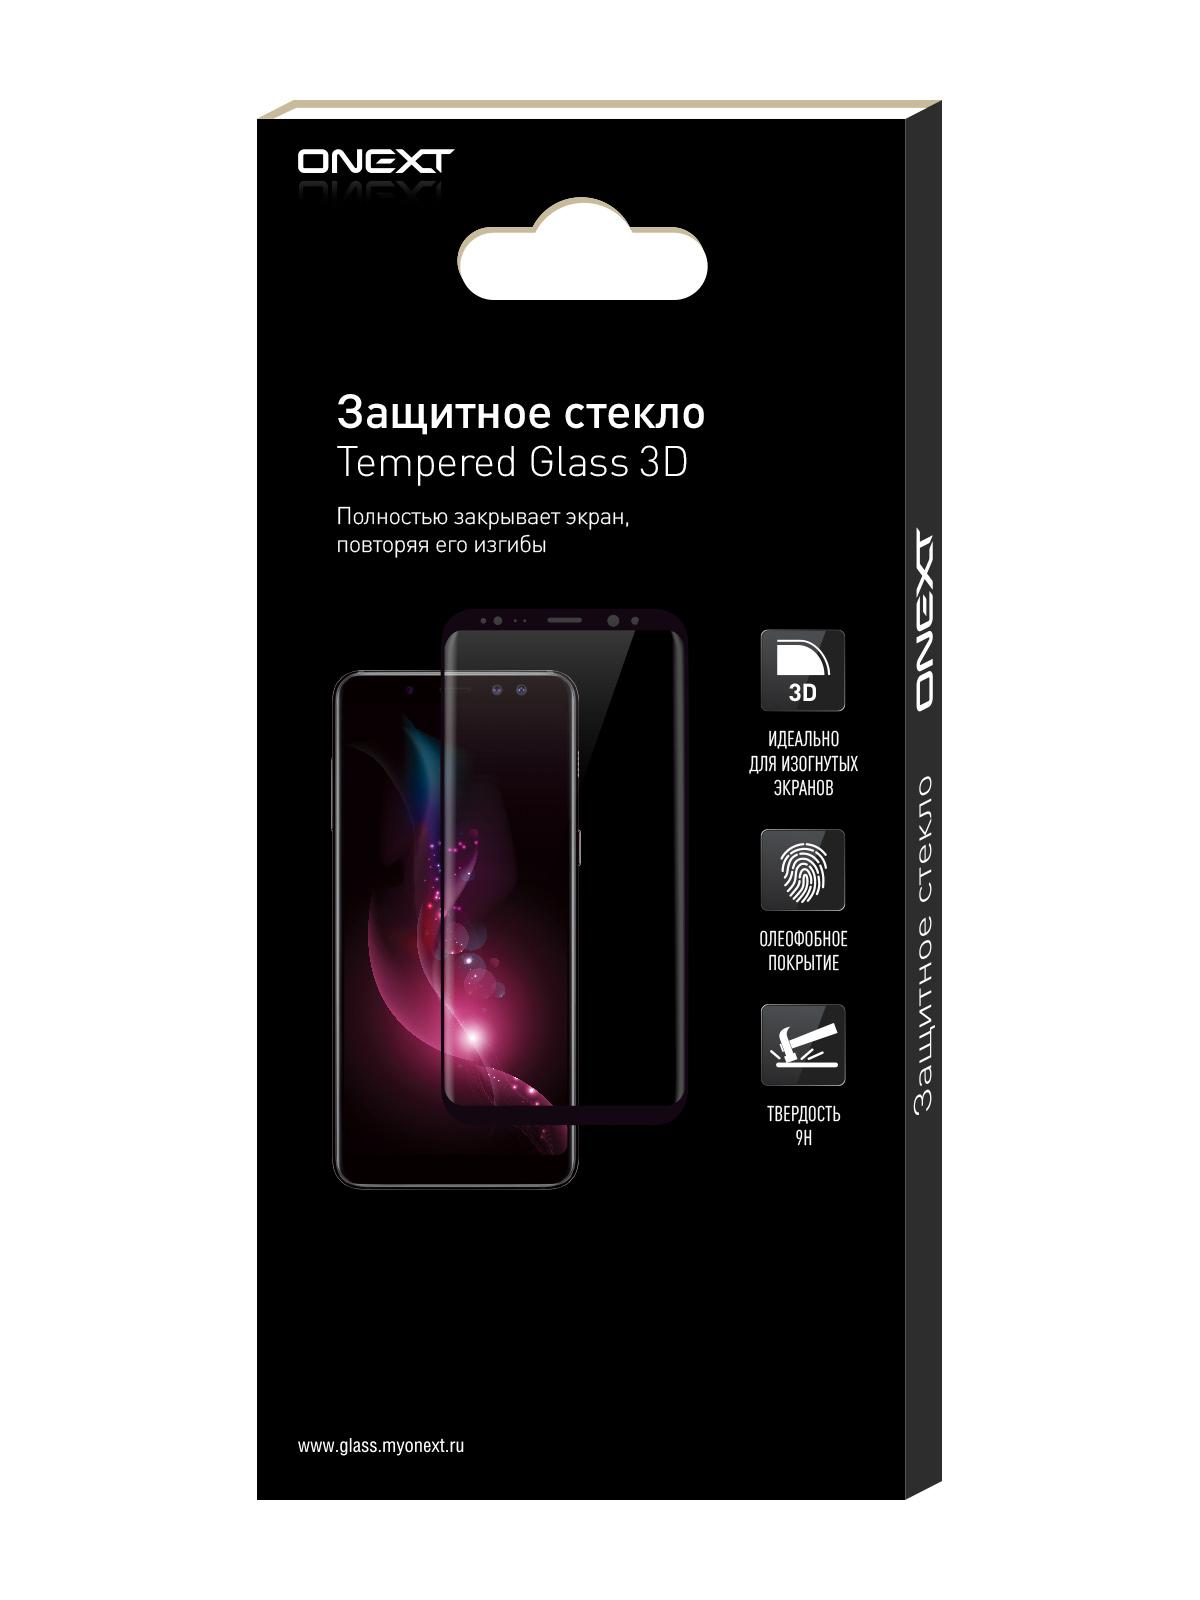 Защитное стекло ONEXT для Samsung Galaxy A5 (2017) Gold